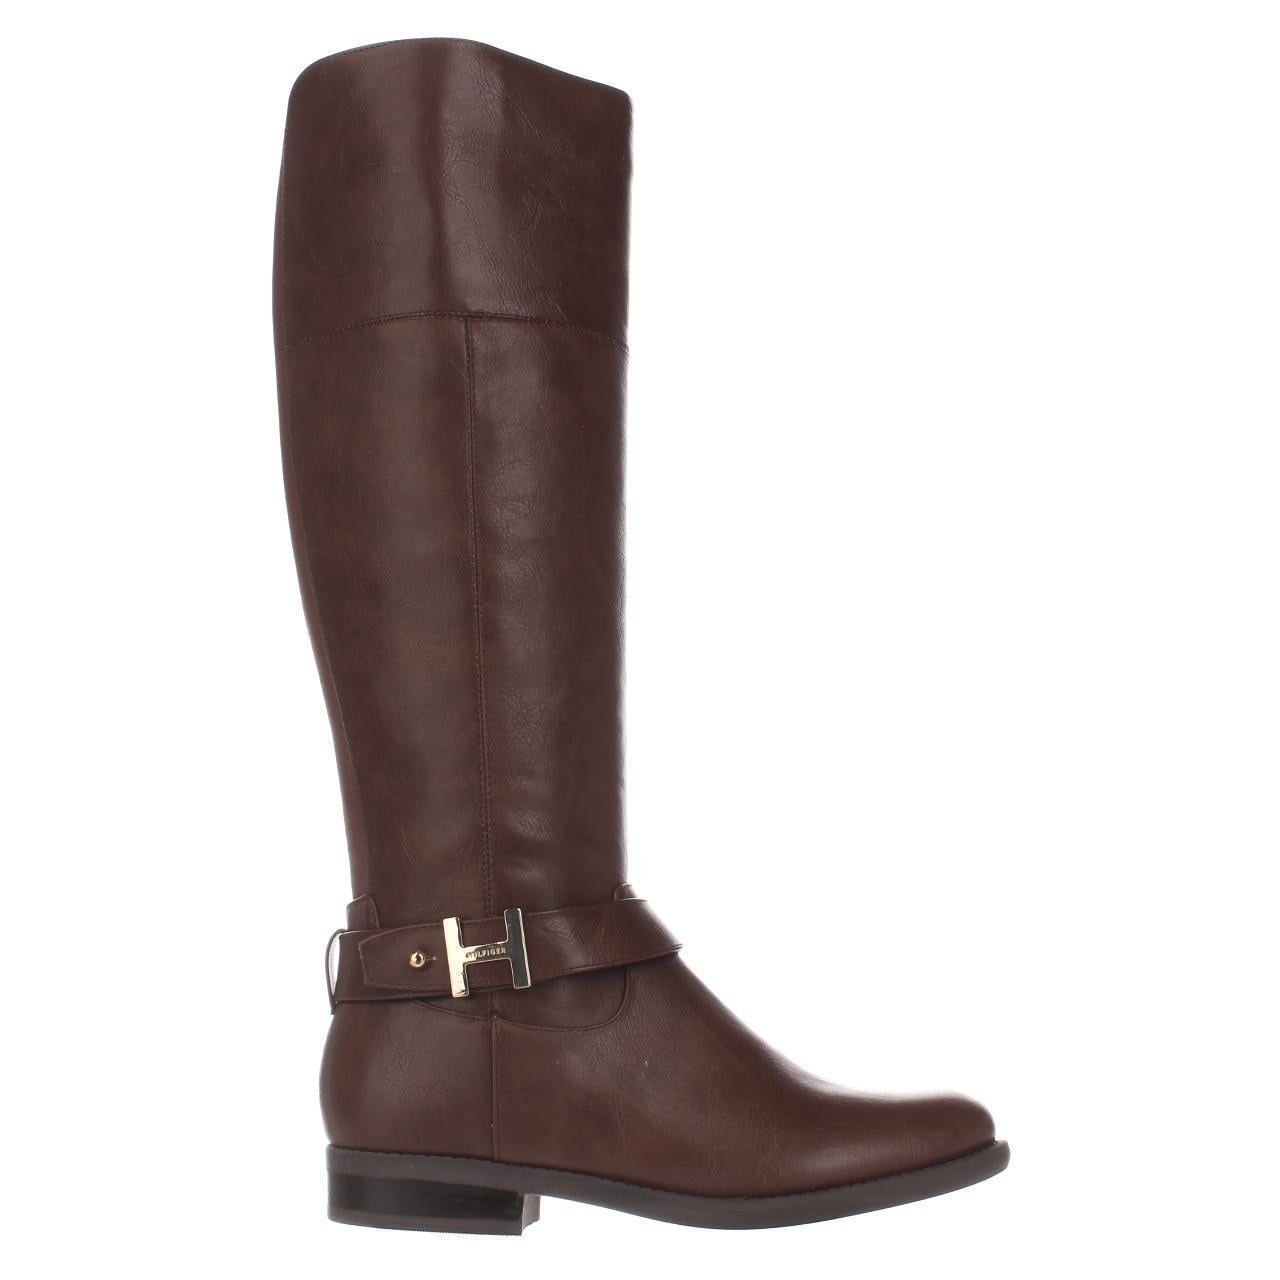 30e772e22 Shop Tommy Hilfiger Shahar Knee High Boots